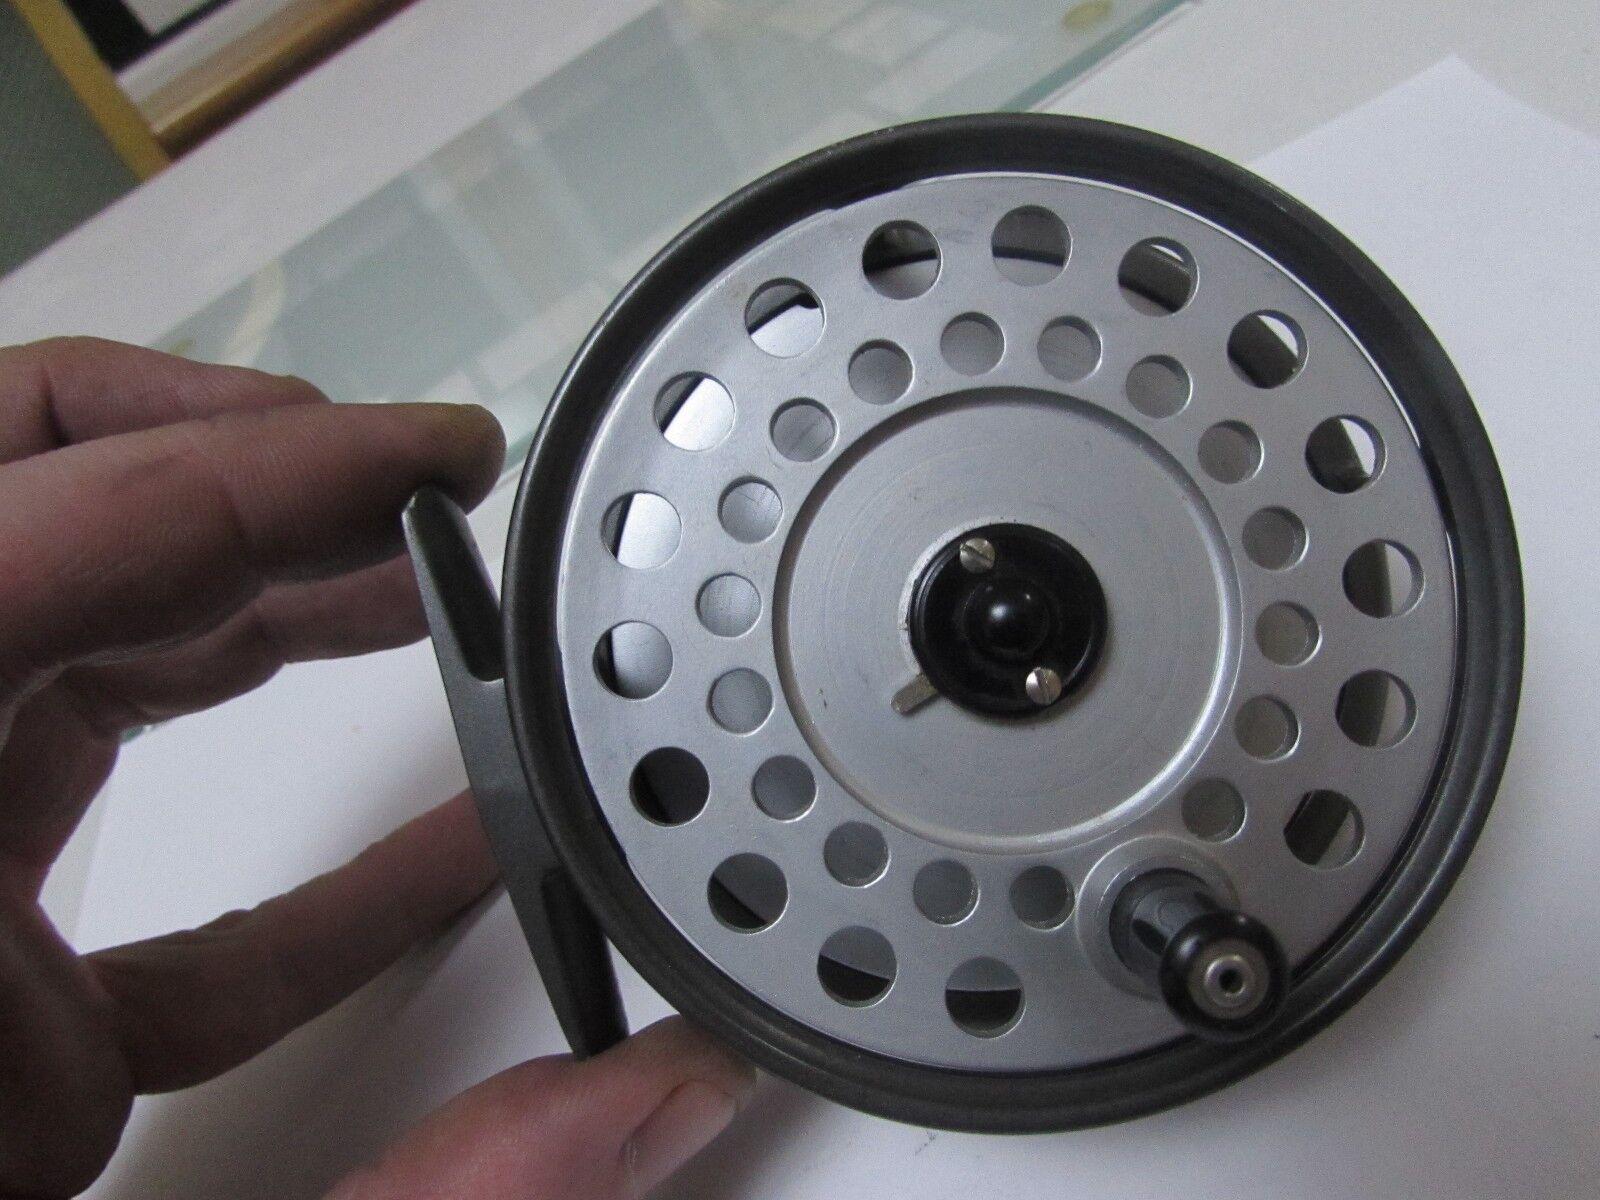 V good vintage hardy viscount 140 trout fly  fishing reel 3 + 5 8ths  order online